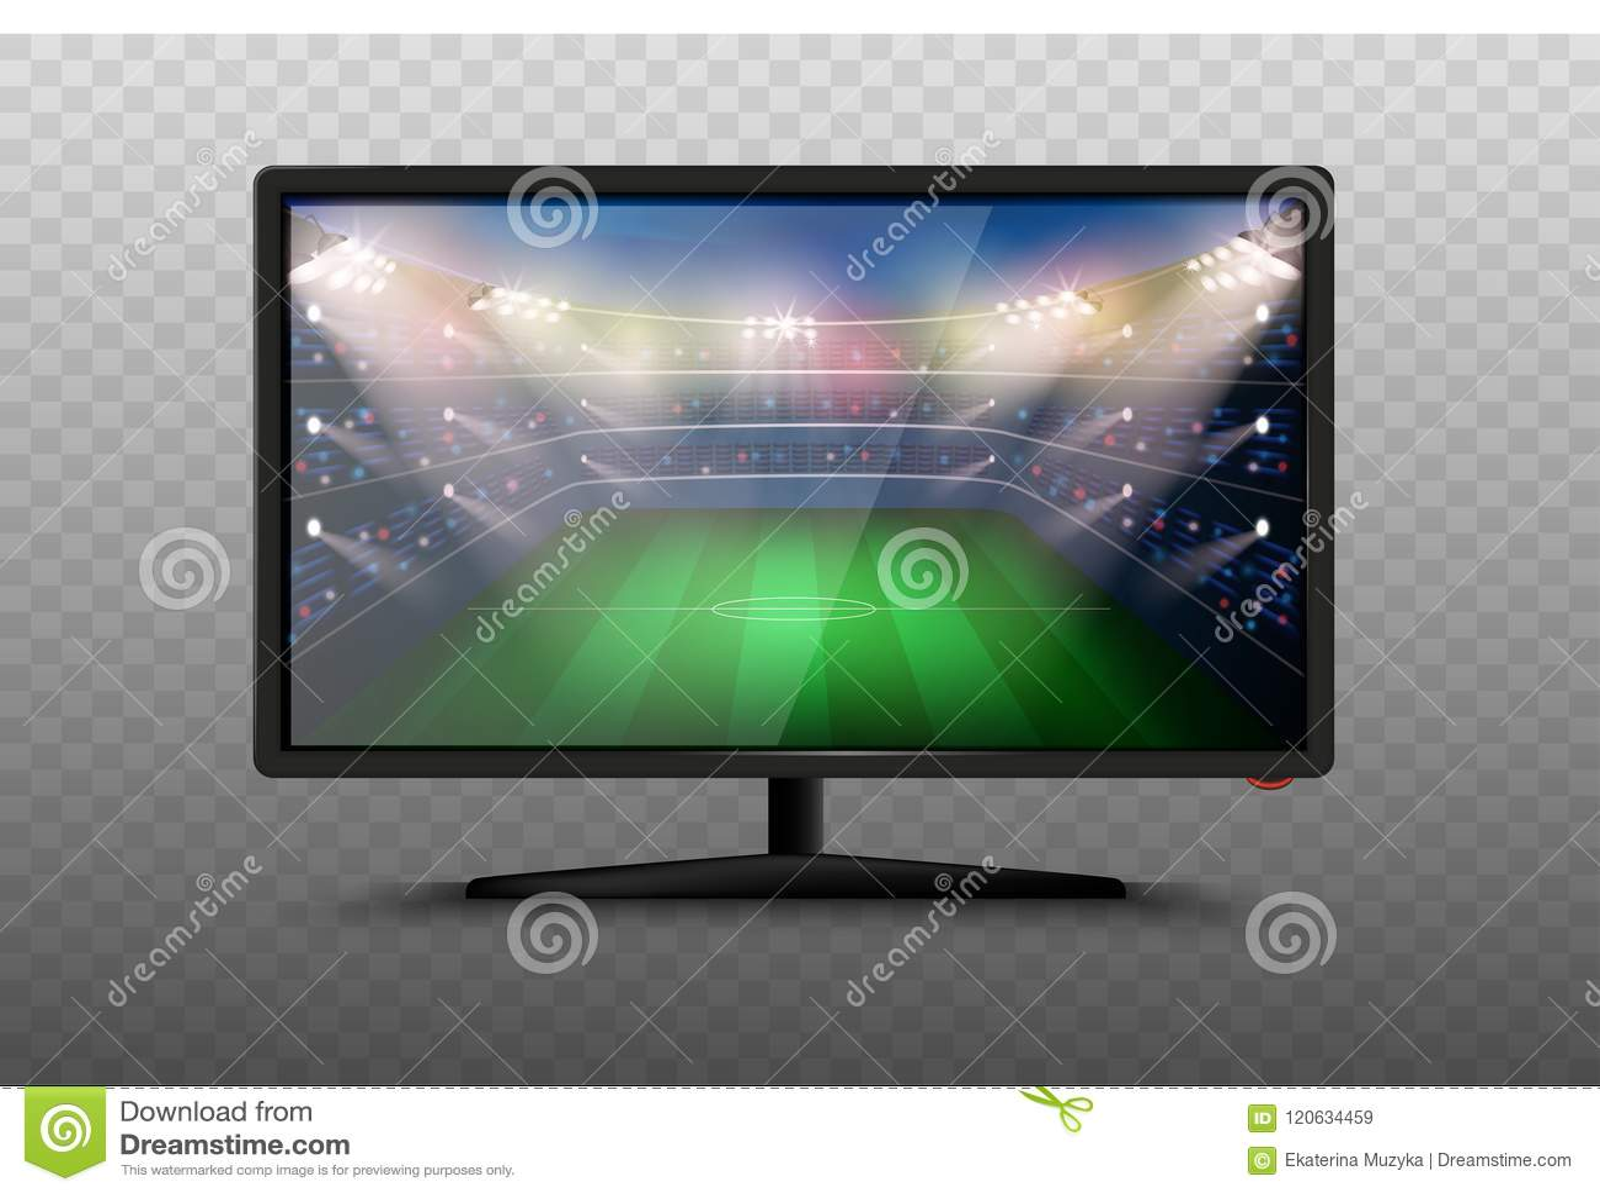 Moderne slimme Televisie 3d vectorillustratie Geïsoleerde realistische pictogrammen op transparante achtergrond LCD het Plasmasch